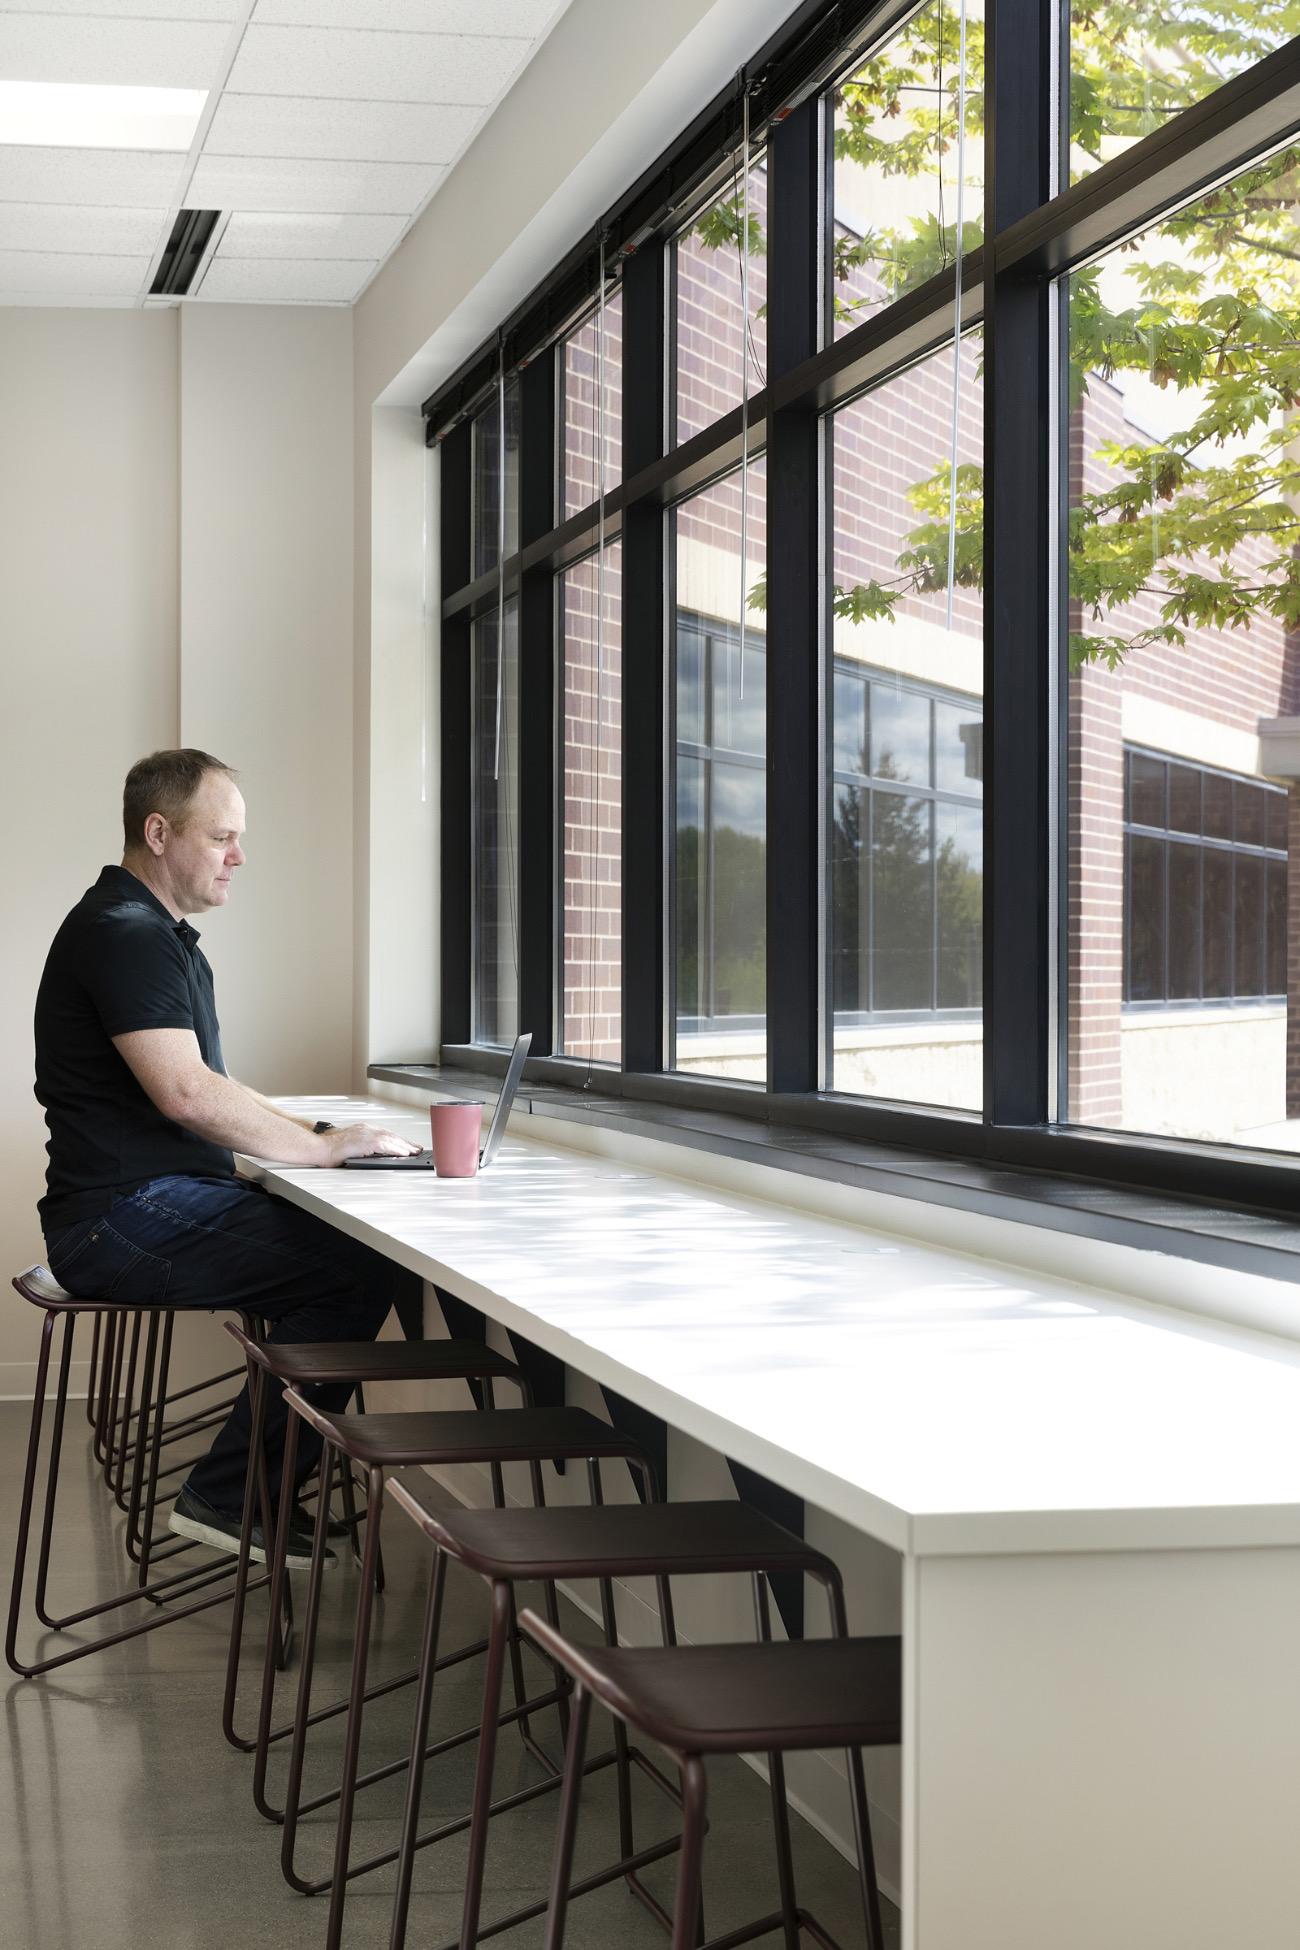 A Peek Inside People Incorporated's New Eagan Office